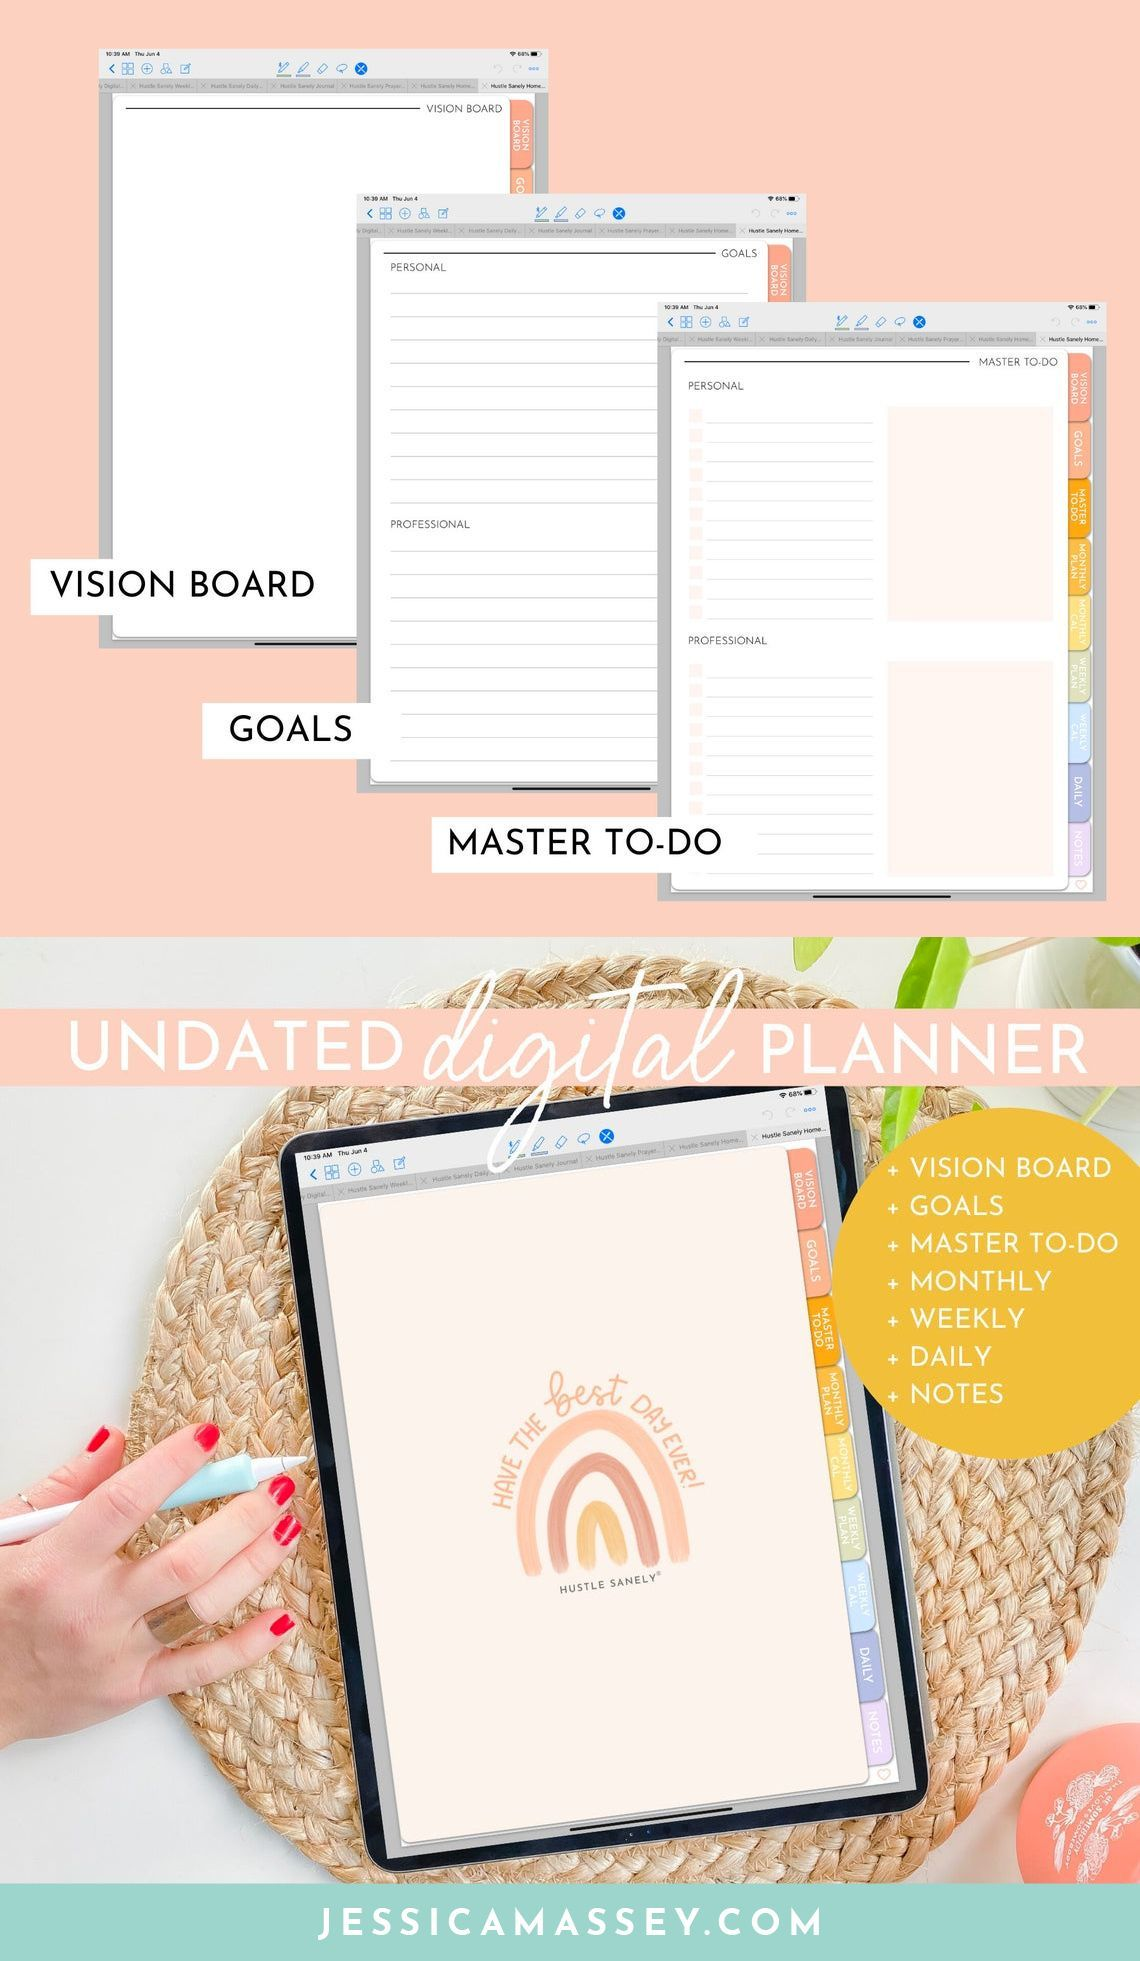 Digital Planning For Ipad Goodnotes App Undated Digital Planner Planning Organization In 2020 Digital Planner Planner Vision Board Planner